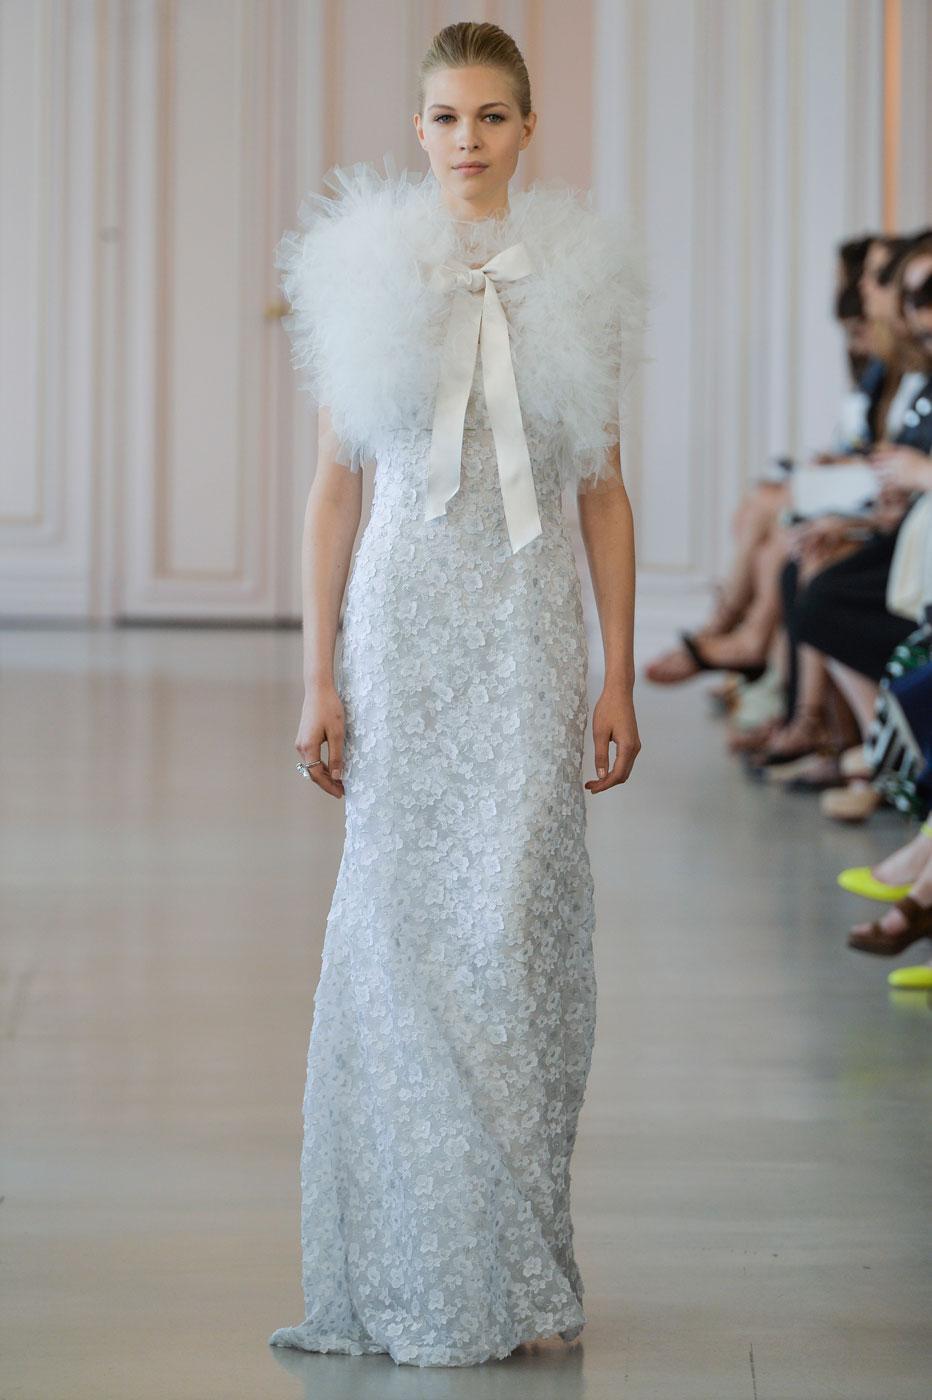 Perfect Oscar Wedding Dresses Pattern - All Wedding Dresses ...